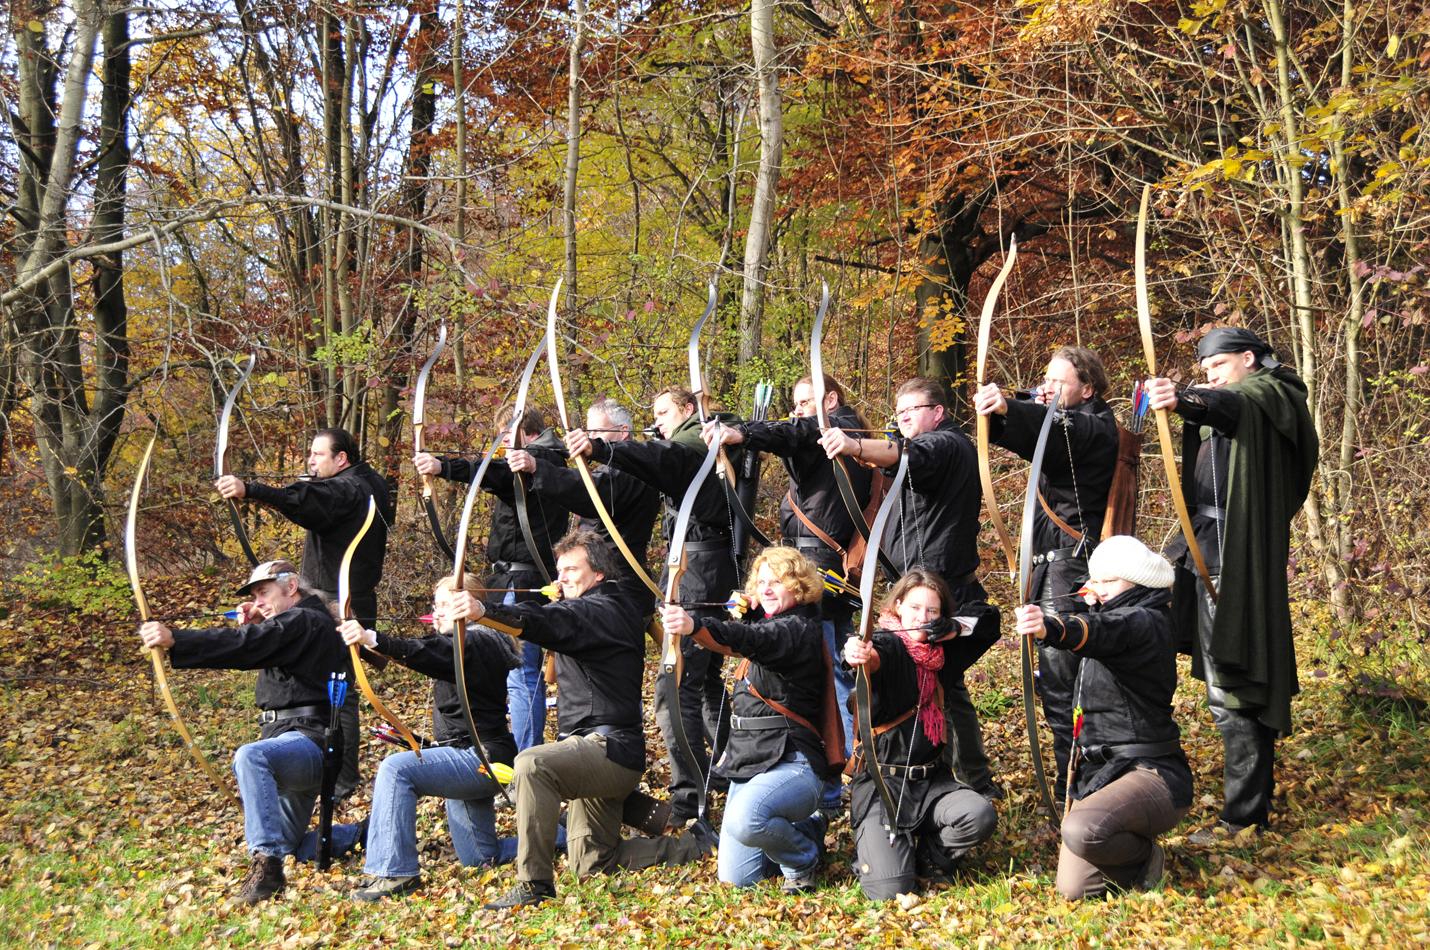 Anfängerkurs Europäische Kampfkunst – Bogen schießen